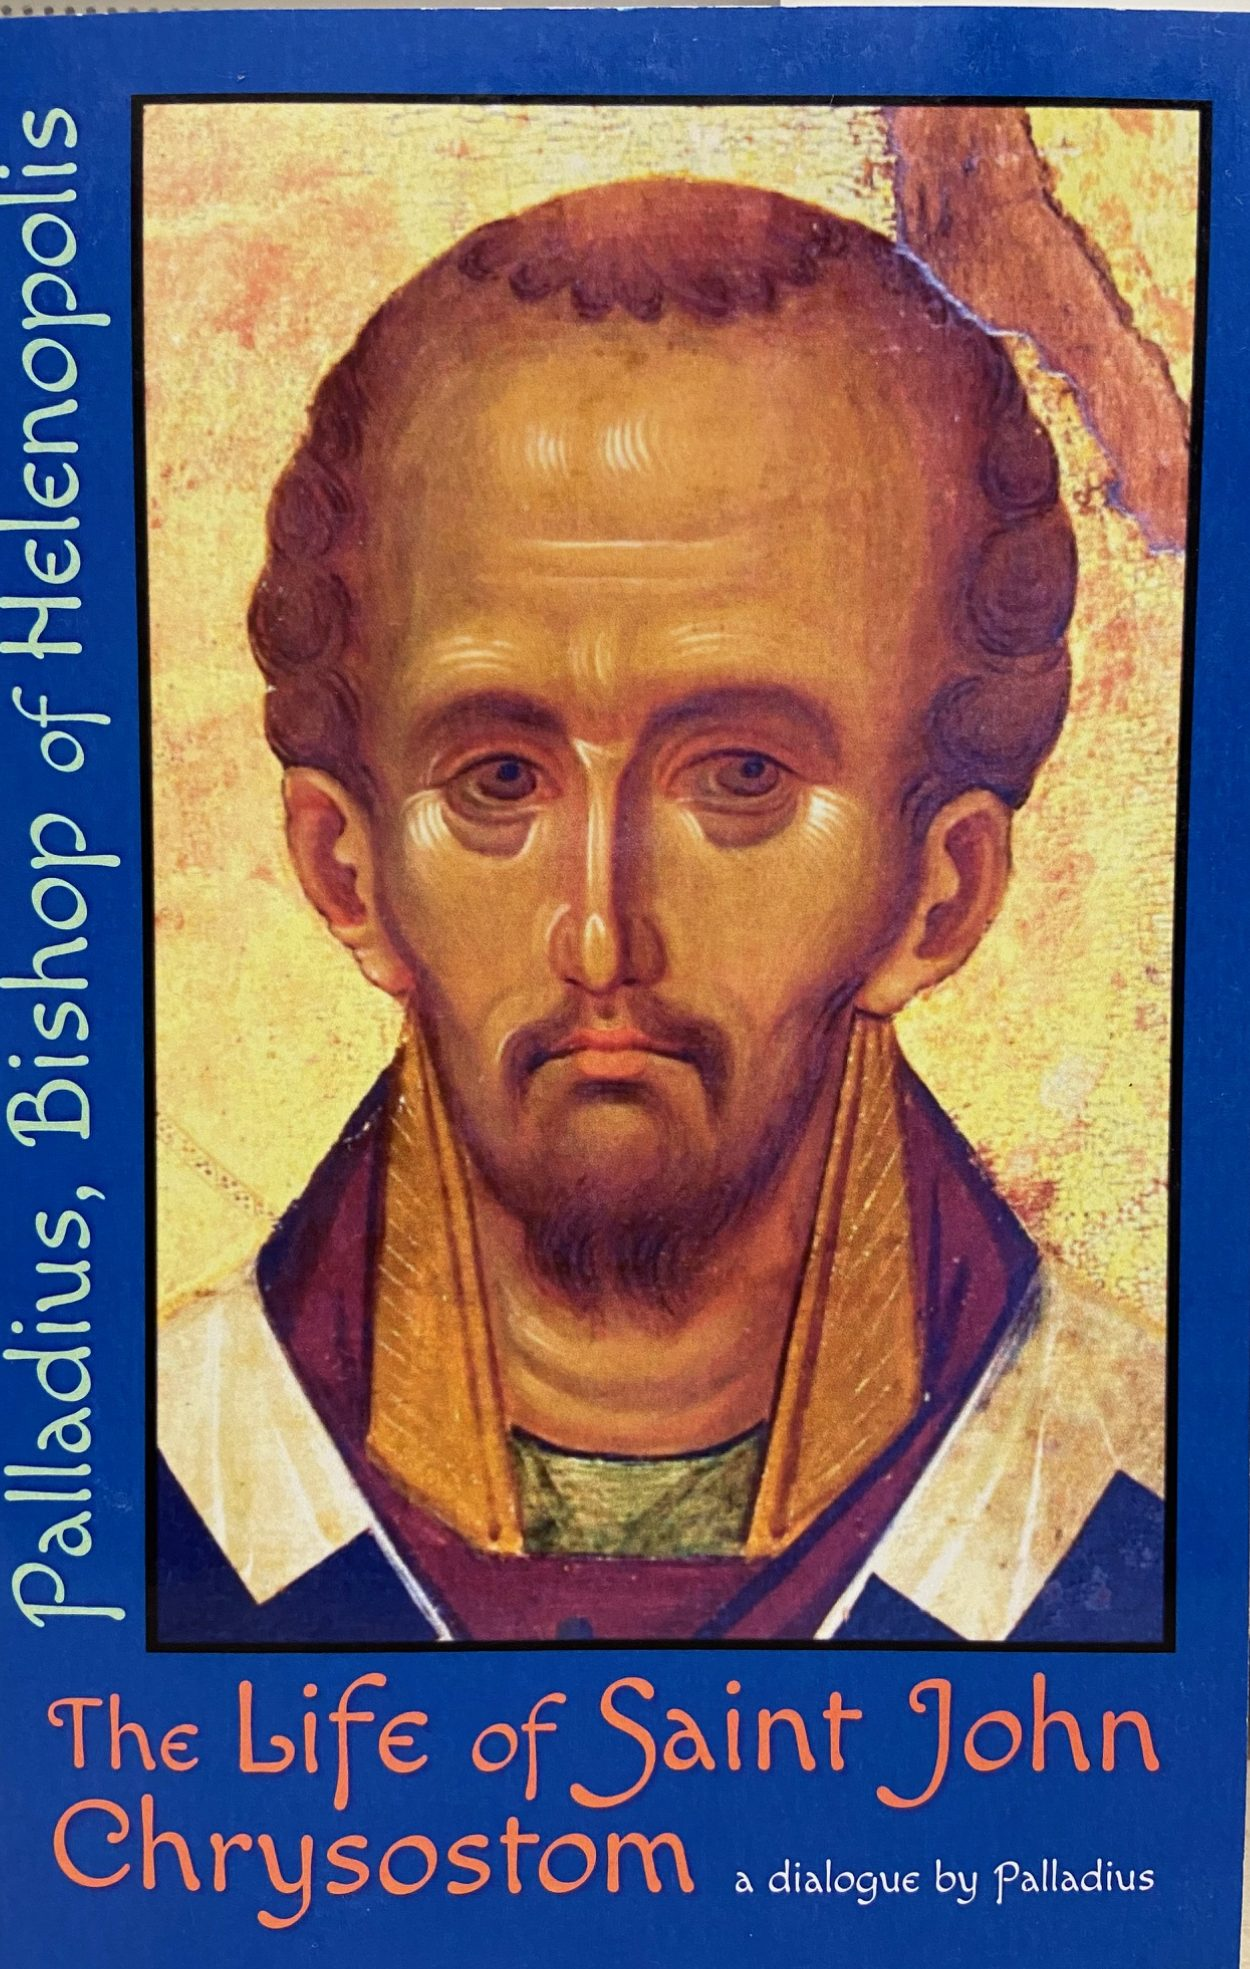 The Life of Saint John Chrysostom: a dialogue by Palladius